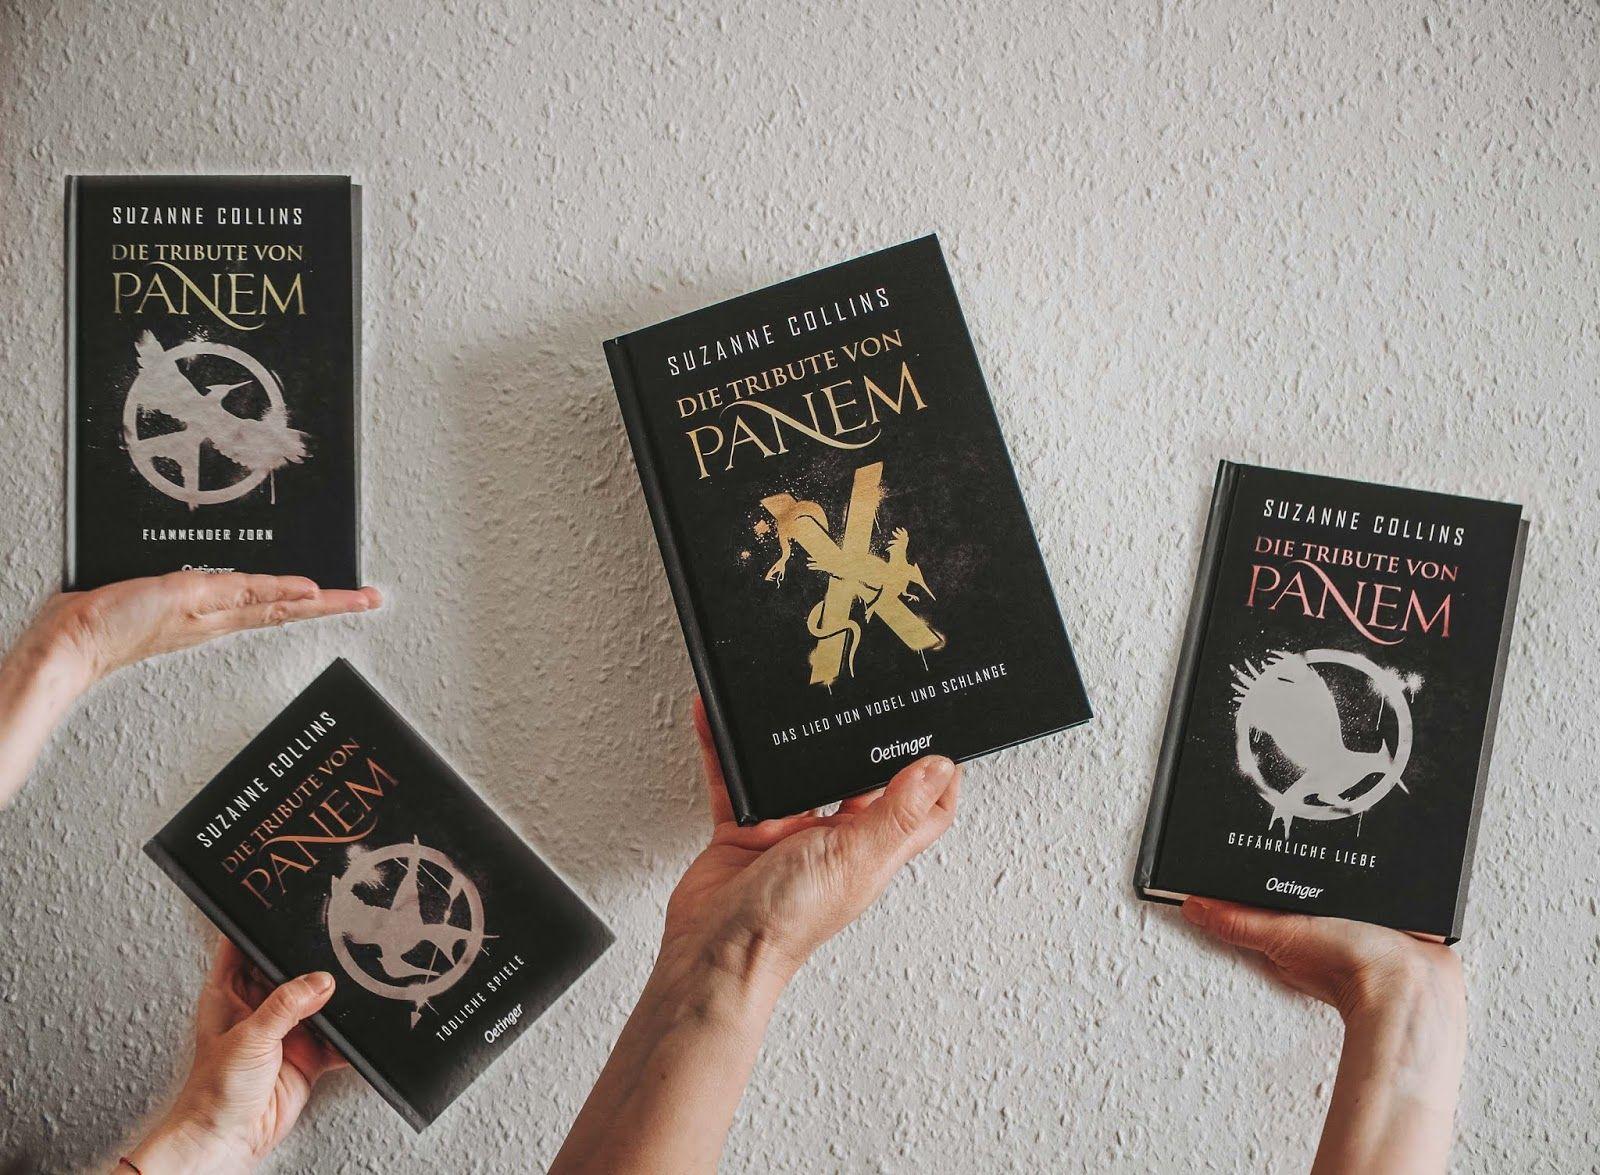 Werbung Die Tribute Von Panem Prequel Panem X Mein Erster Leseeindruck Panem Tribute Von Panem Tribute